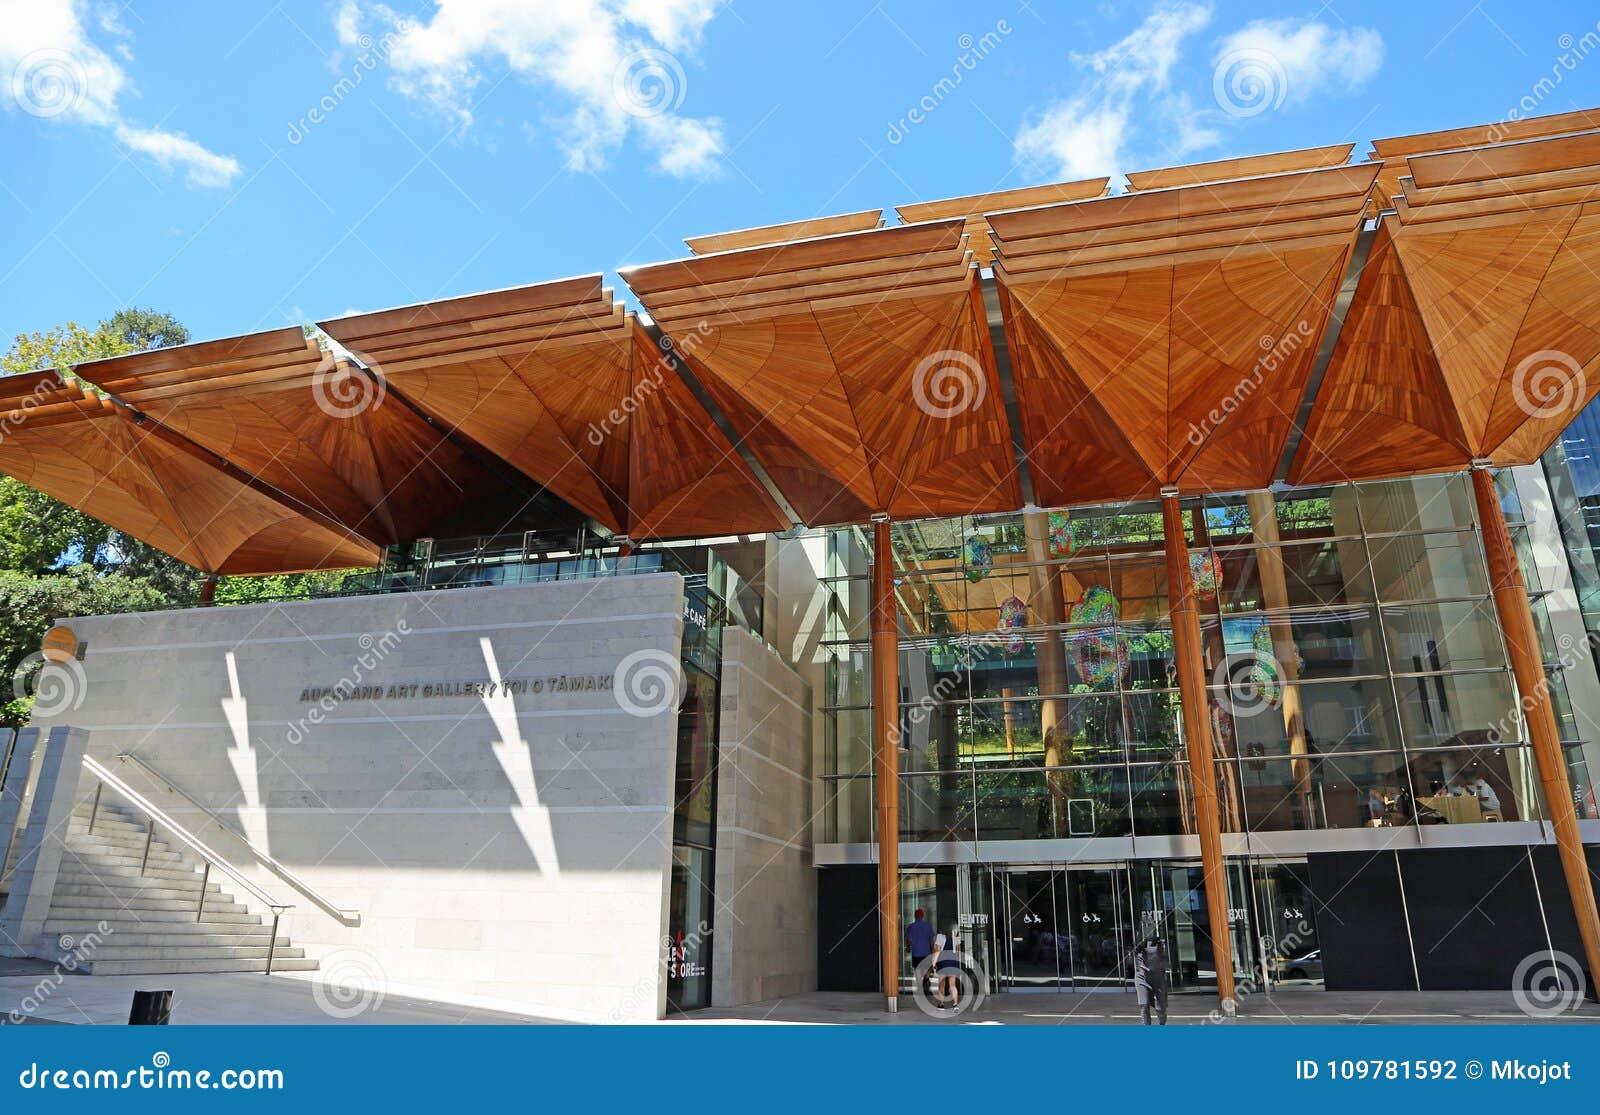 Entrée moderne vers Auckland Art Gallery Toi o Tamaki